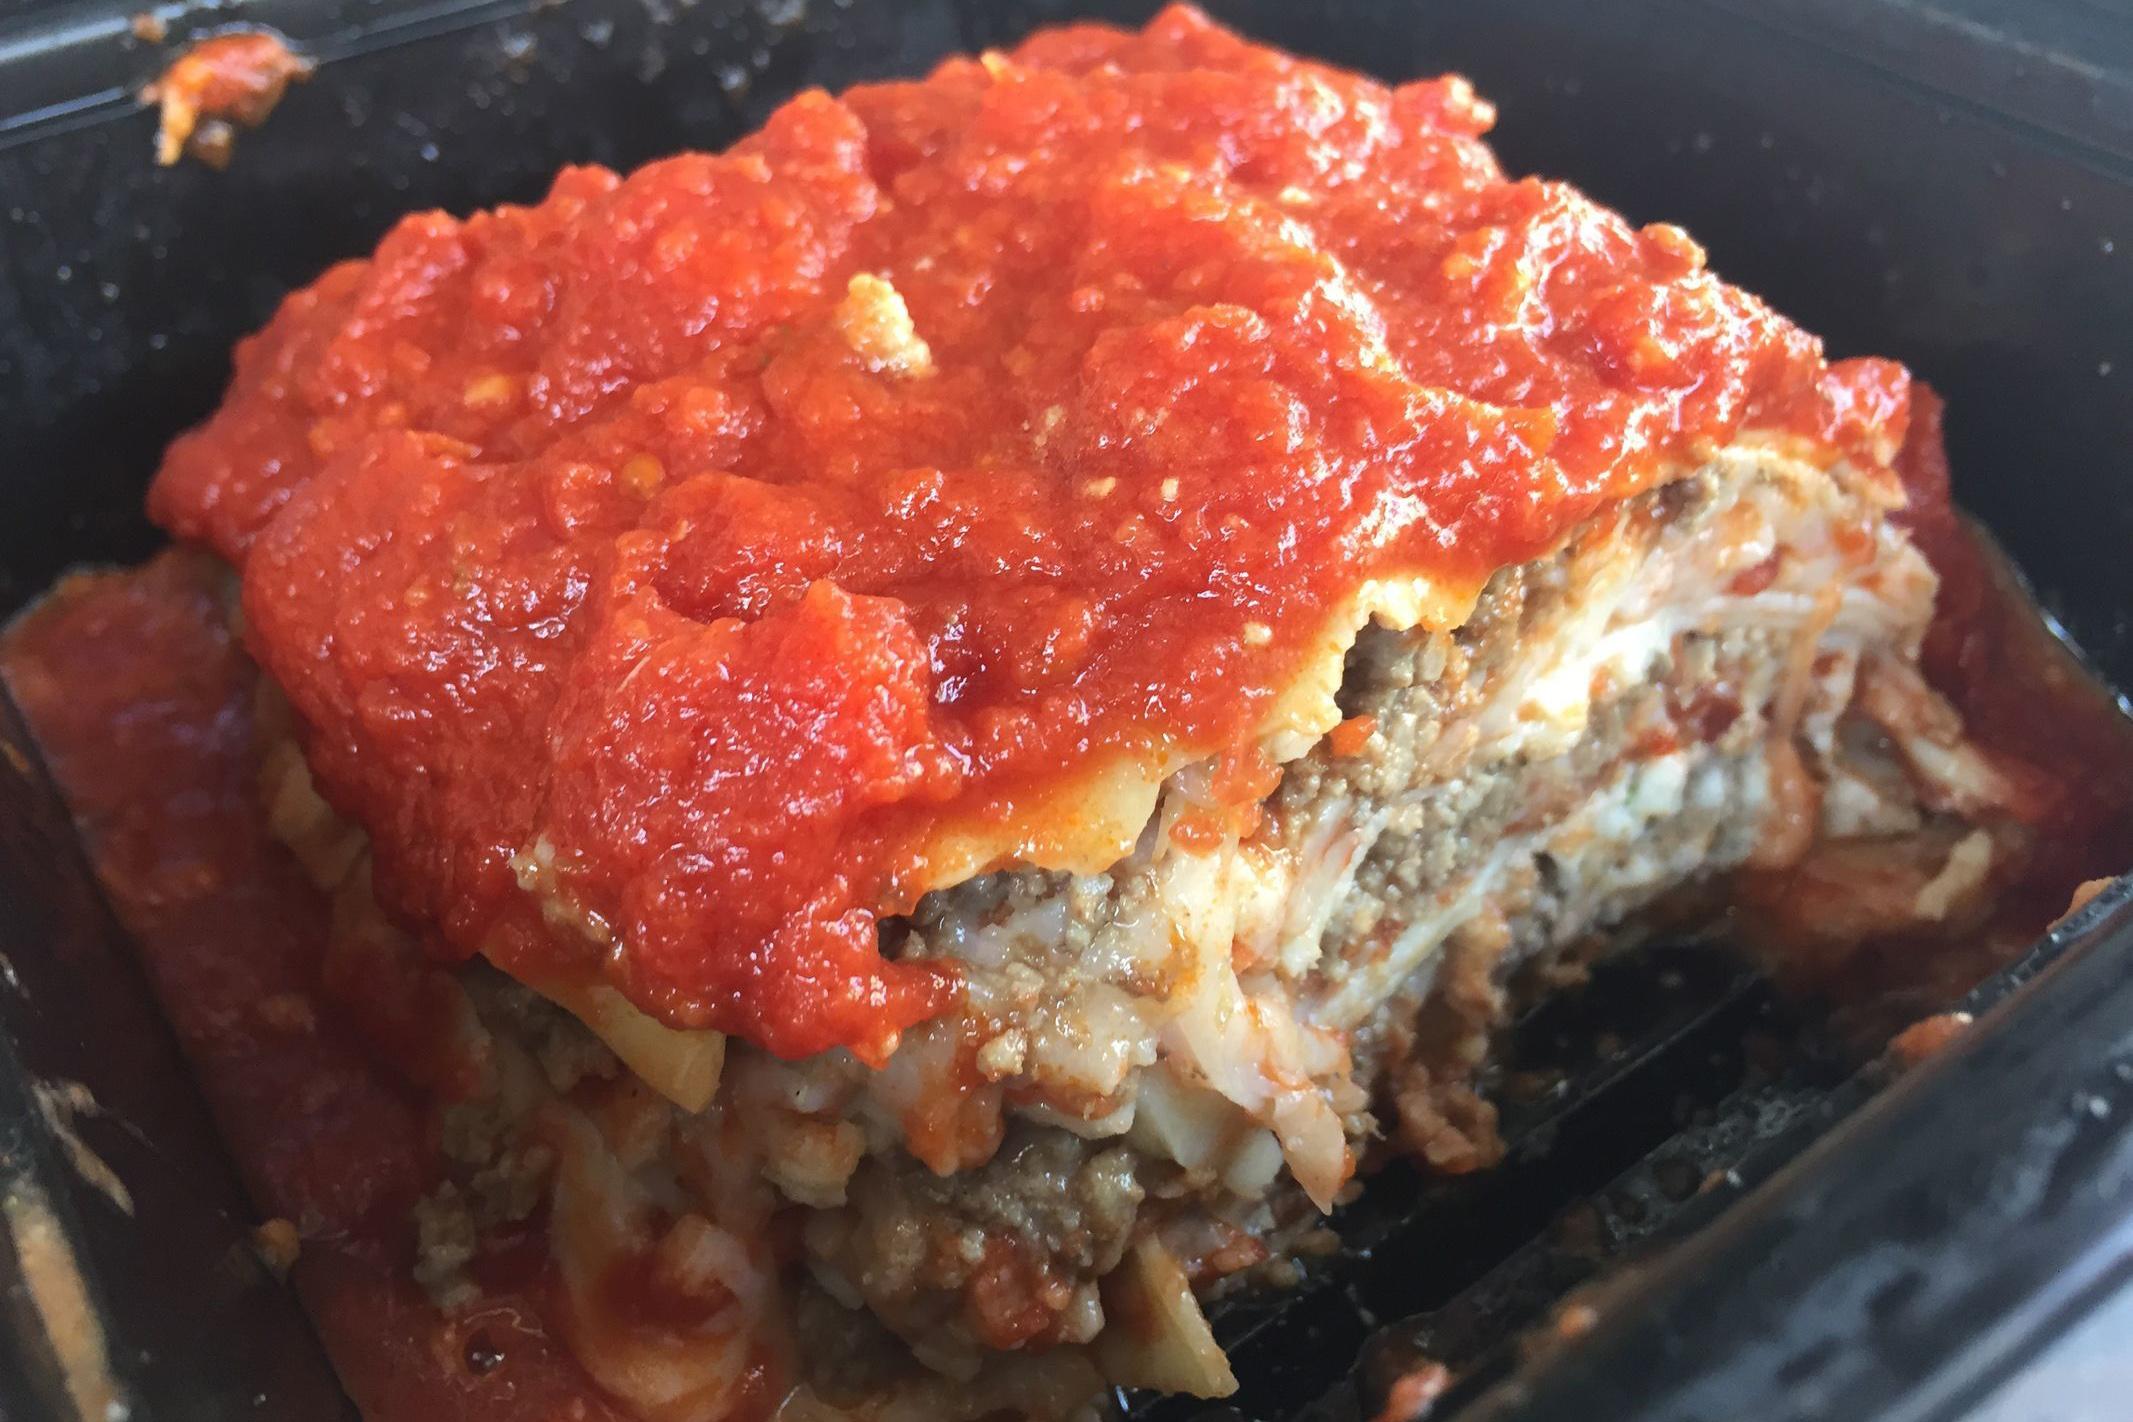 The meat lasagna to go at Carlino's Market in Ardmore. (CRAIG LABAN / Staff)